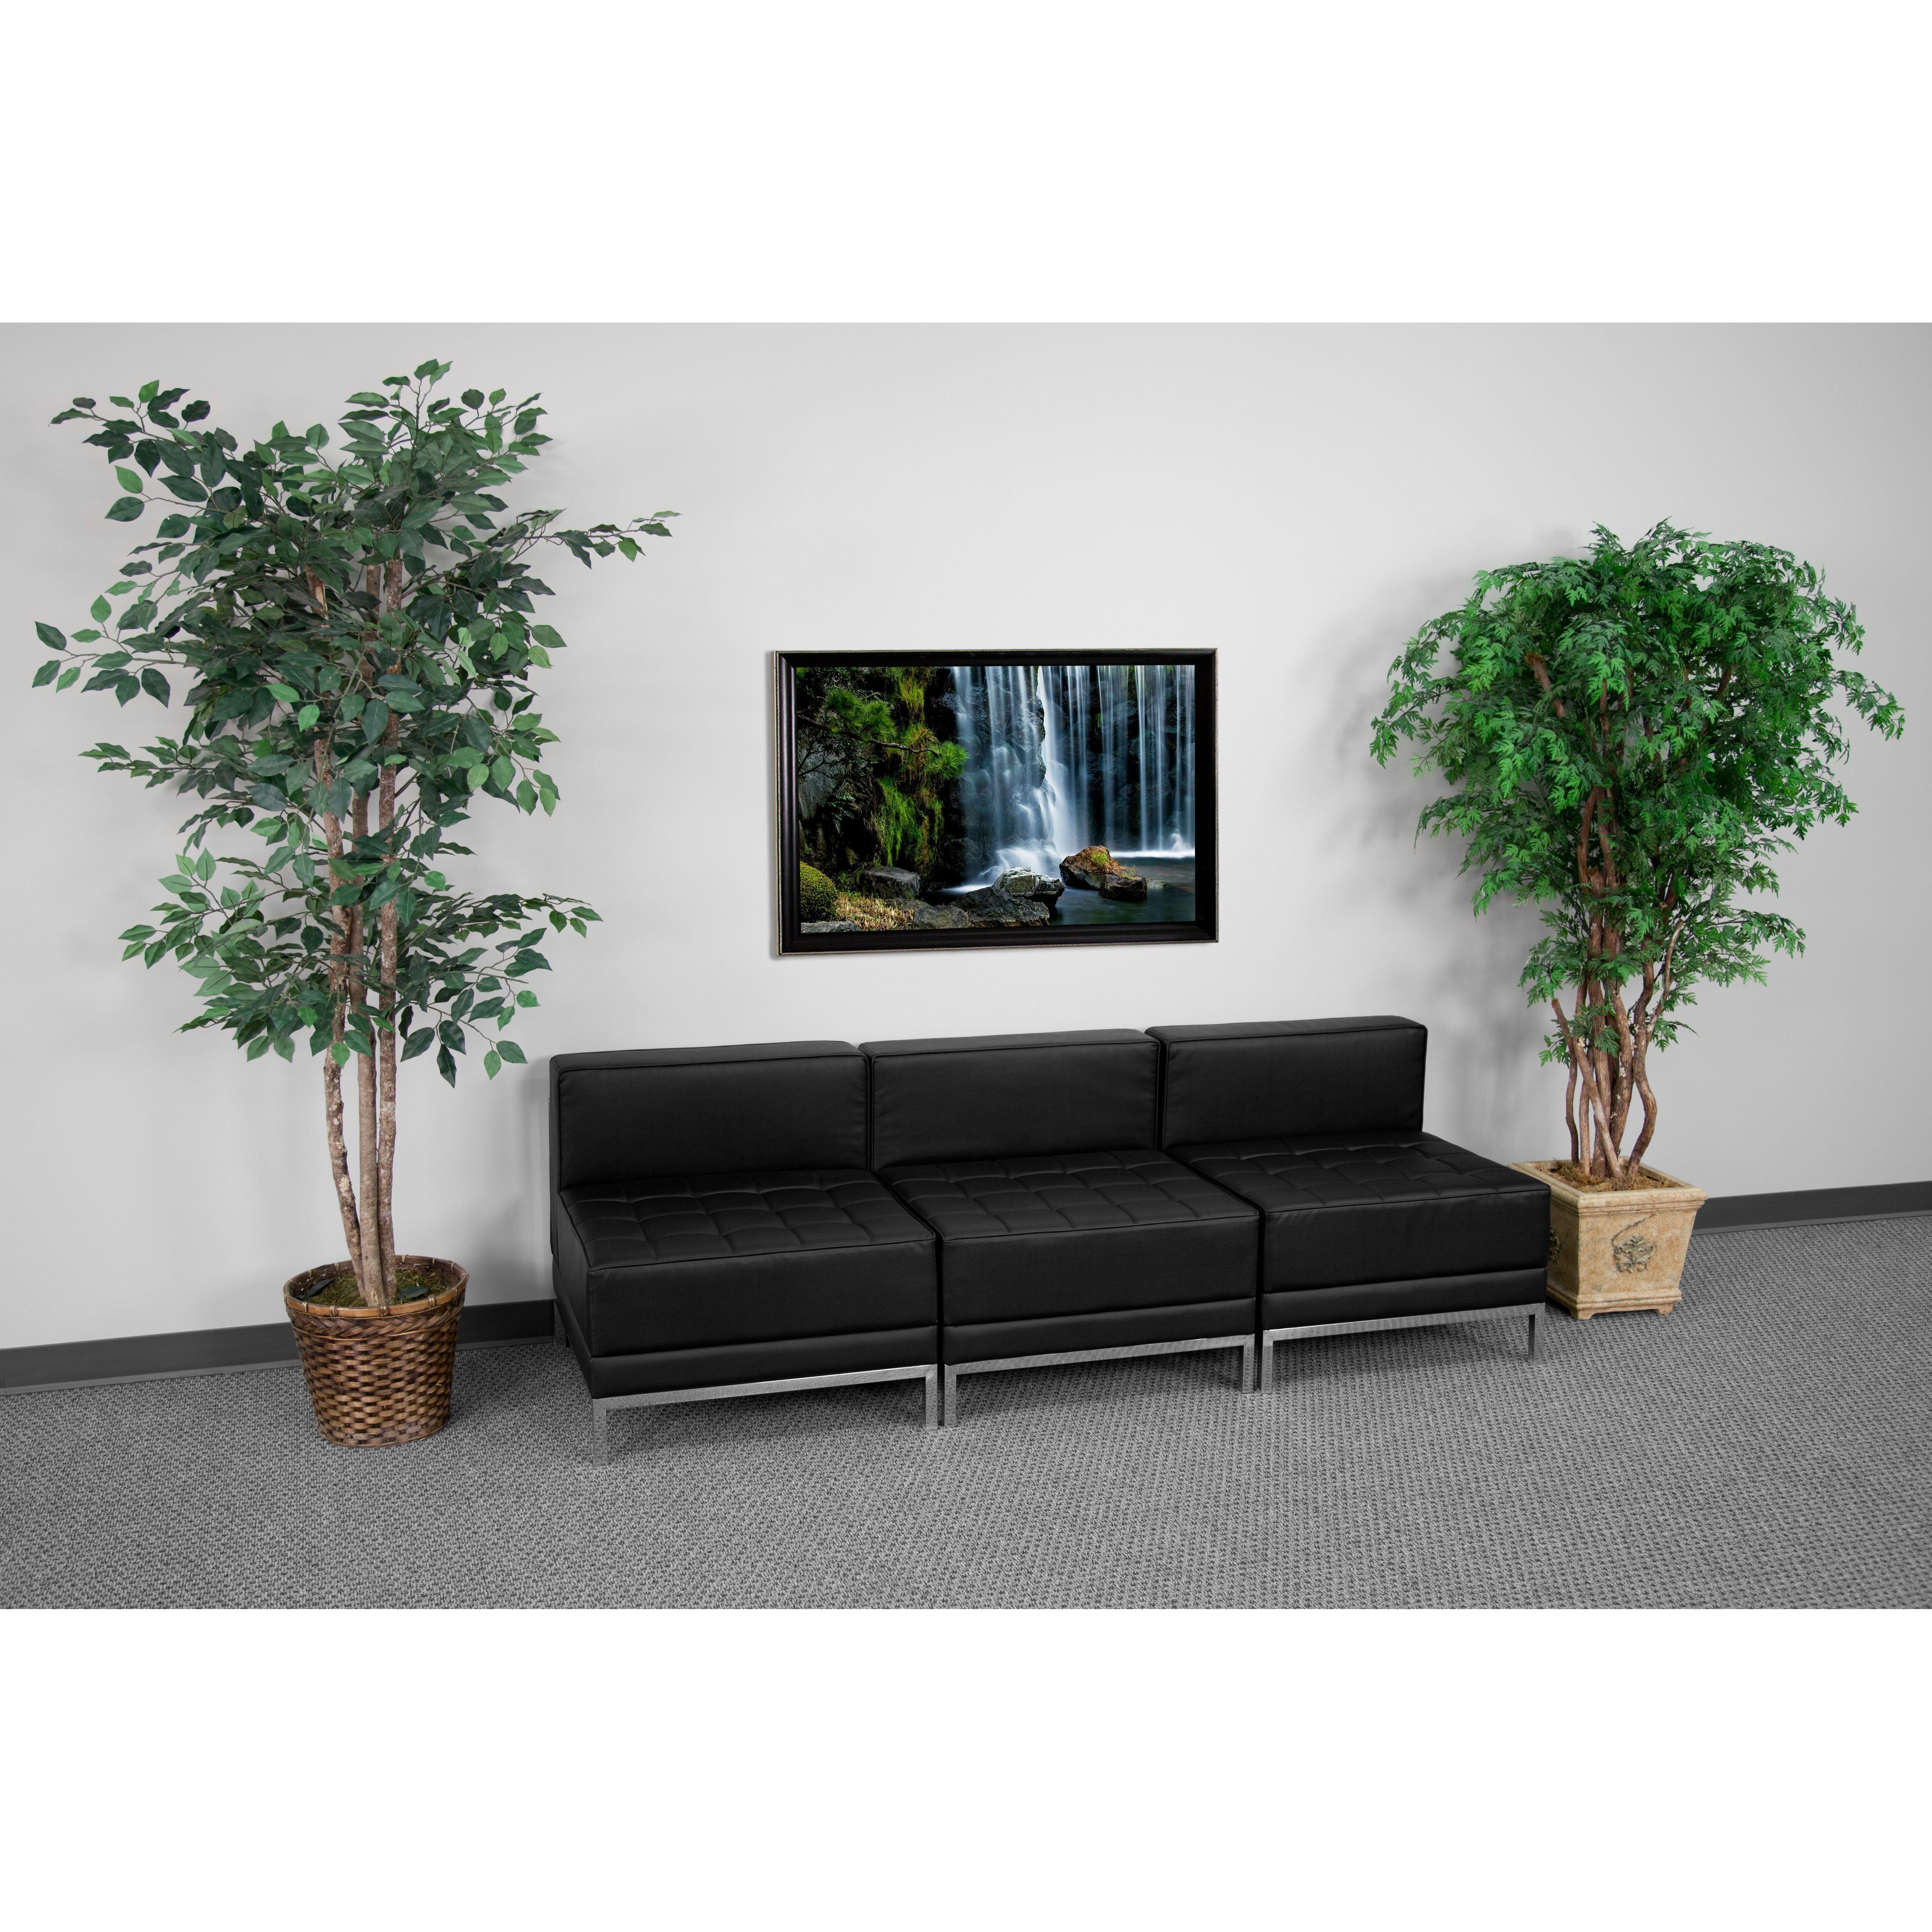 Flash Furniture ZB-IMAG-MIDCH-3-GG HERCULES Imagination Series Lounge Set, 3 Seats